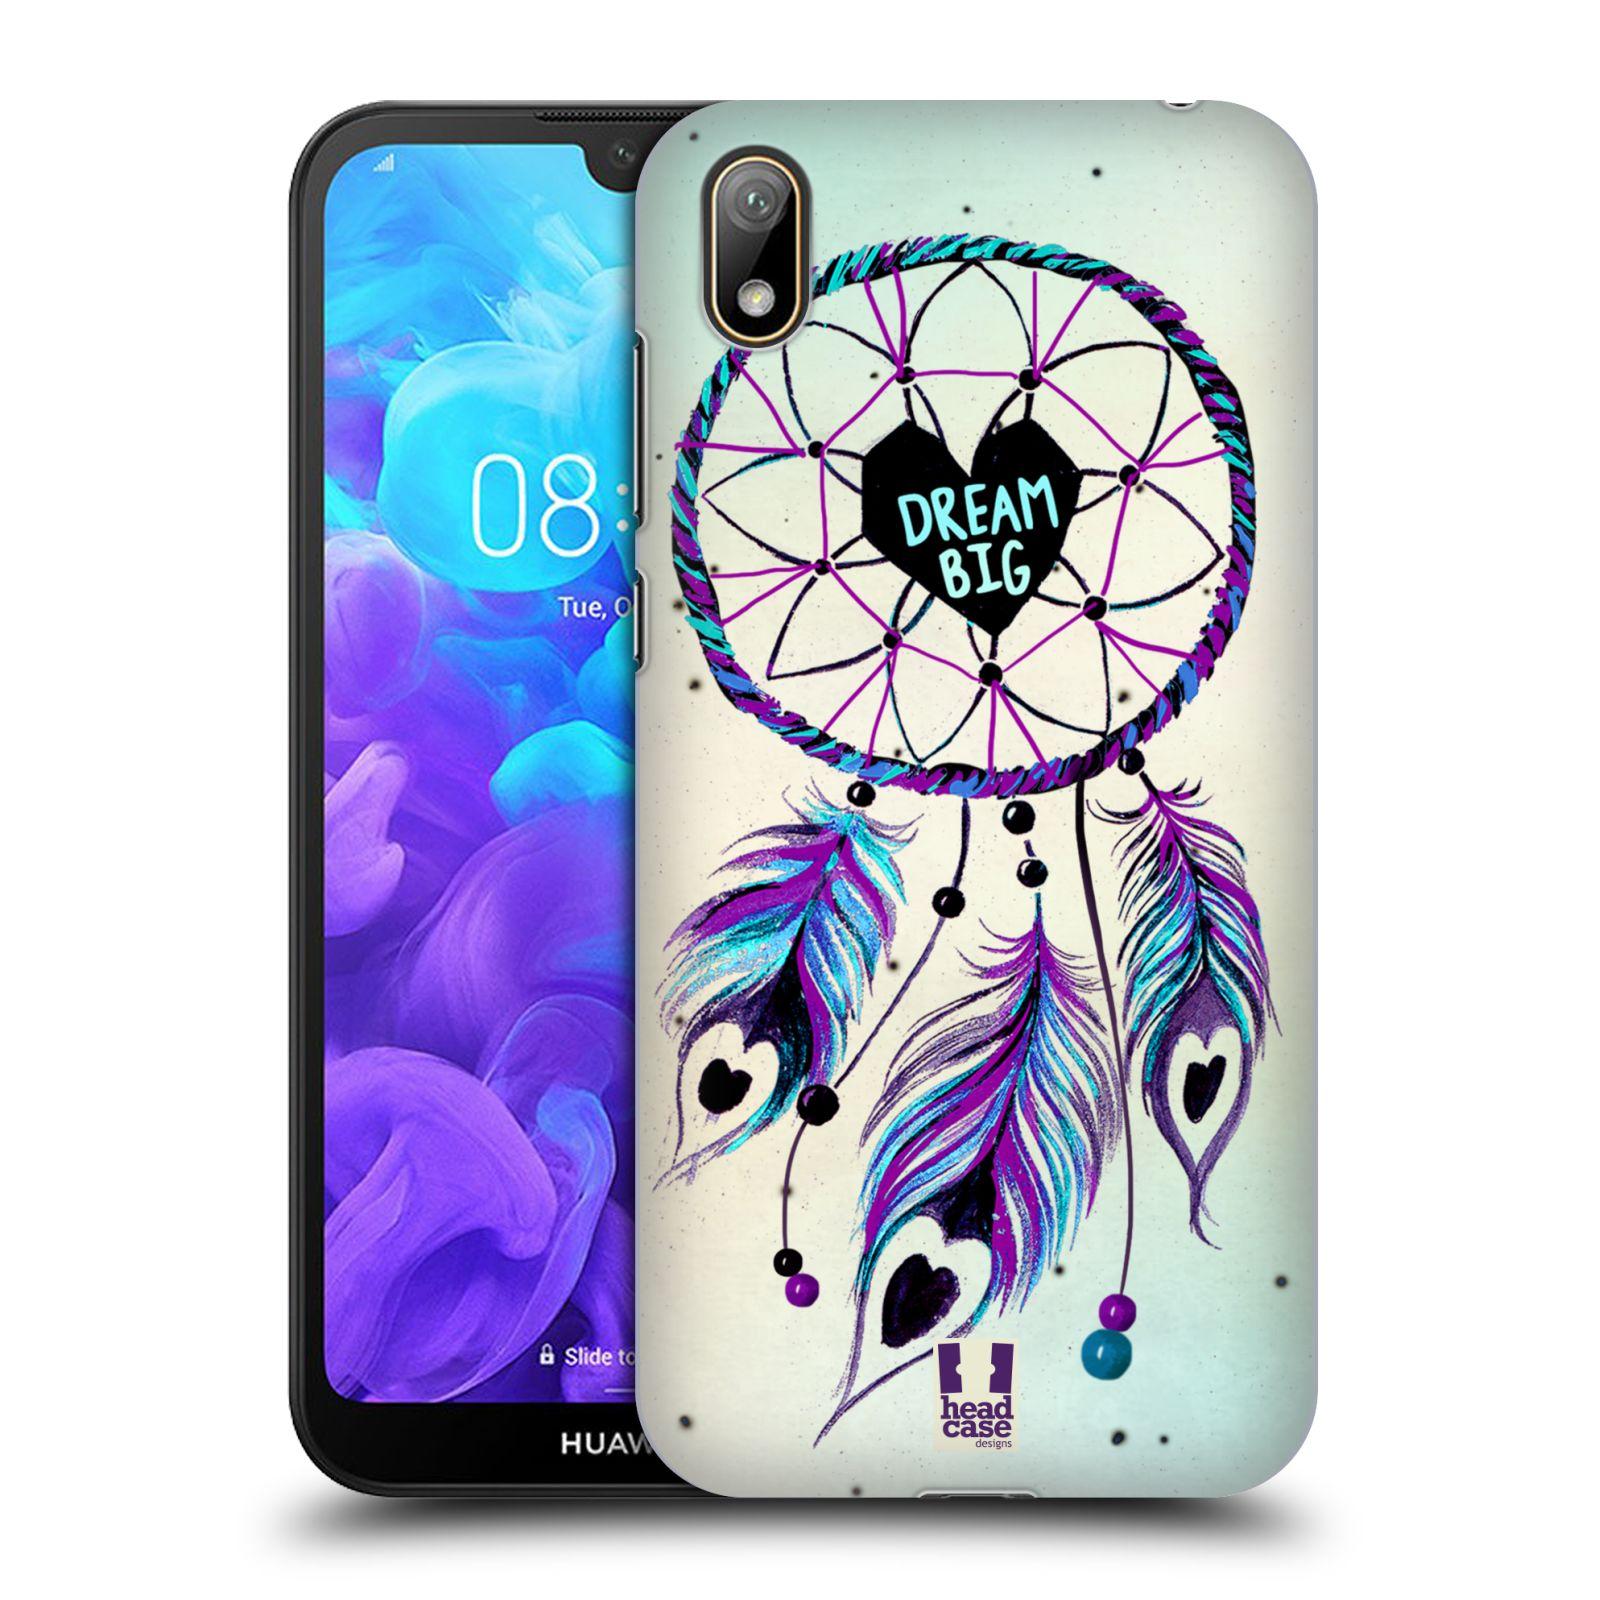 Plastové pouzdro na mobil Honor 8S - Head Case - Lapač Assorted Dream Big Srdce